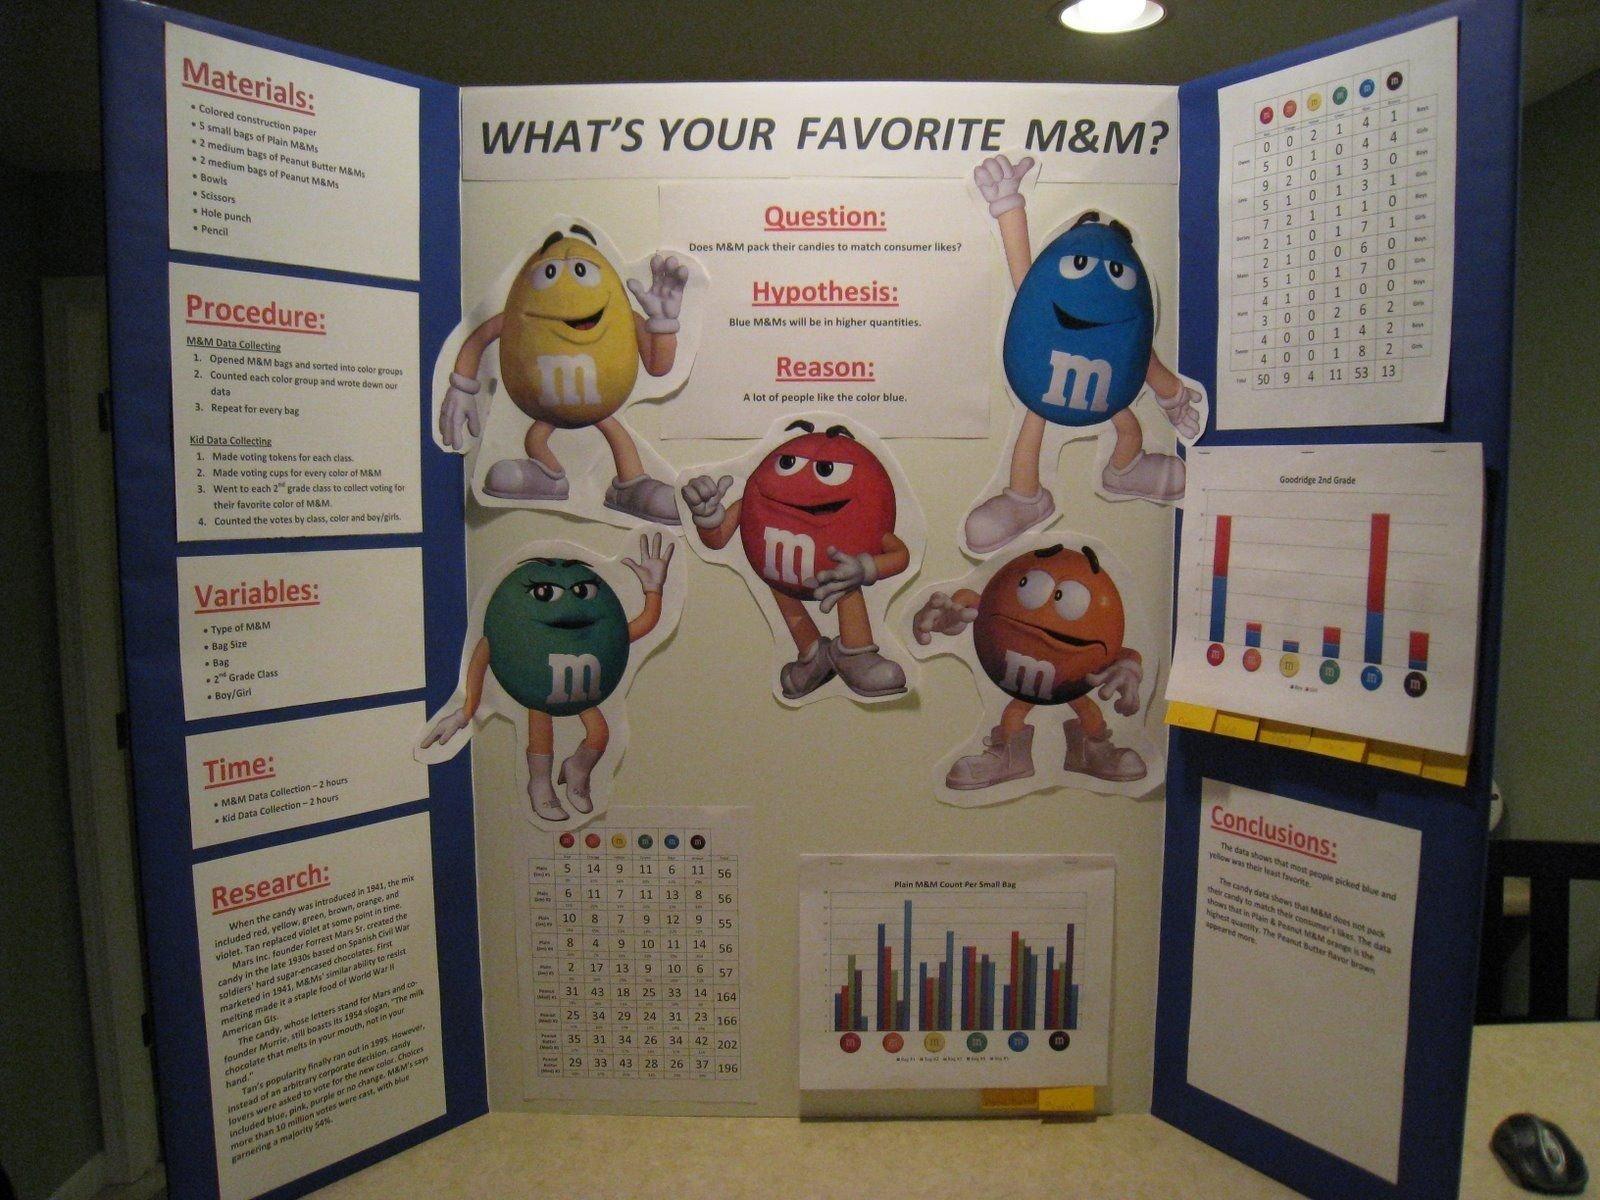 10 Best Science Fair Project Ideas List 8th grade science project ideas list homeshealth 64 2020